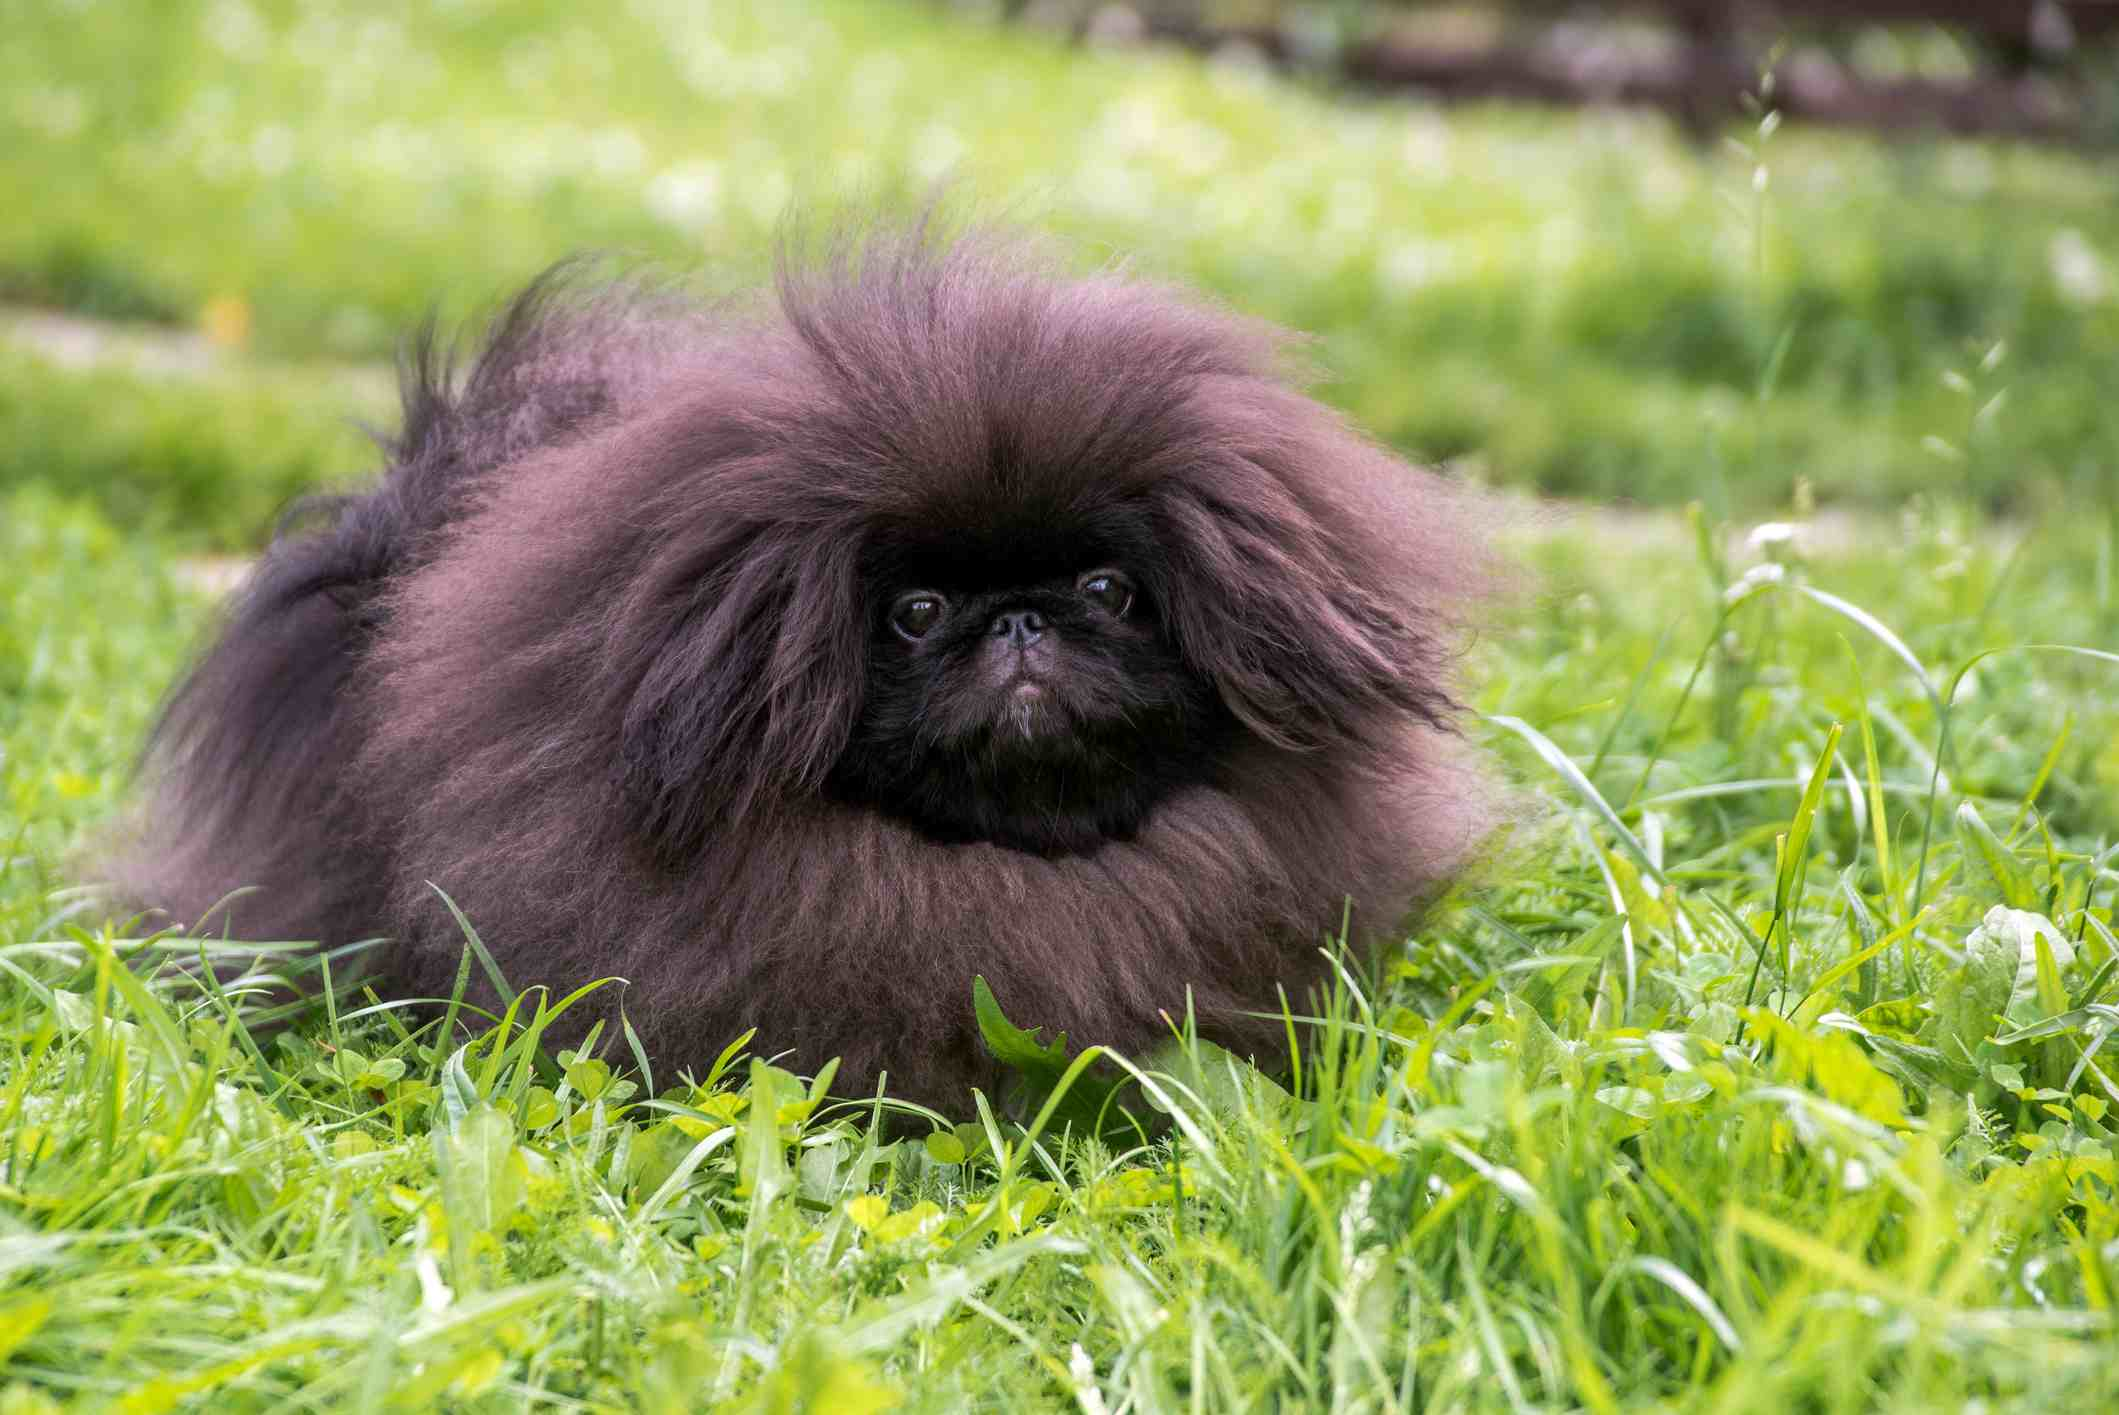 Cute black puppy pekingese dog sitting on the green grass